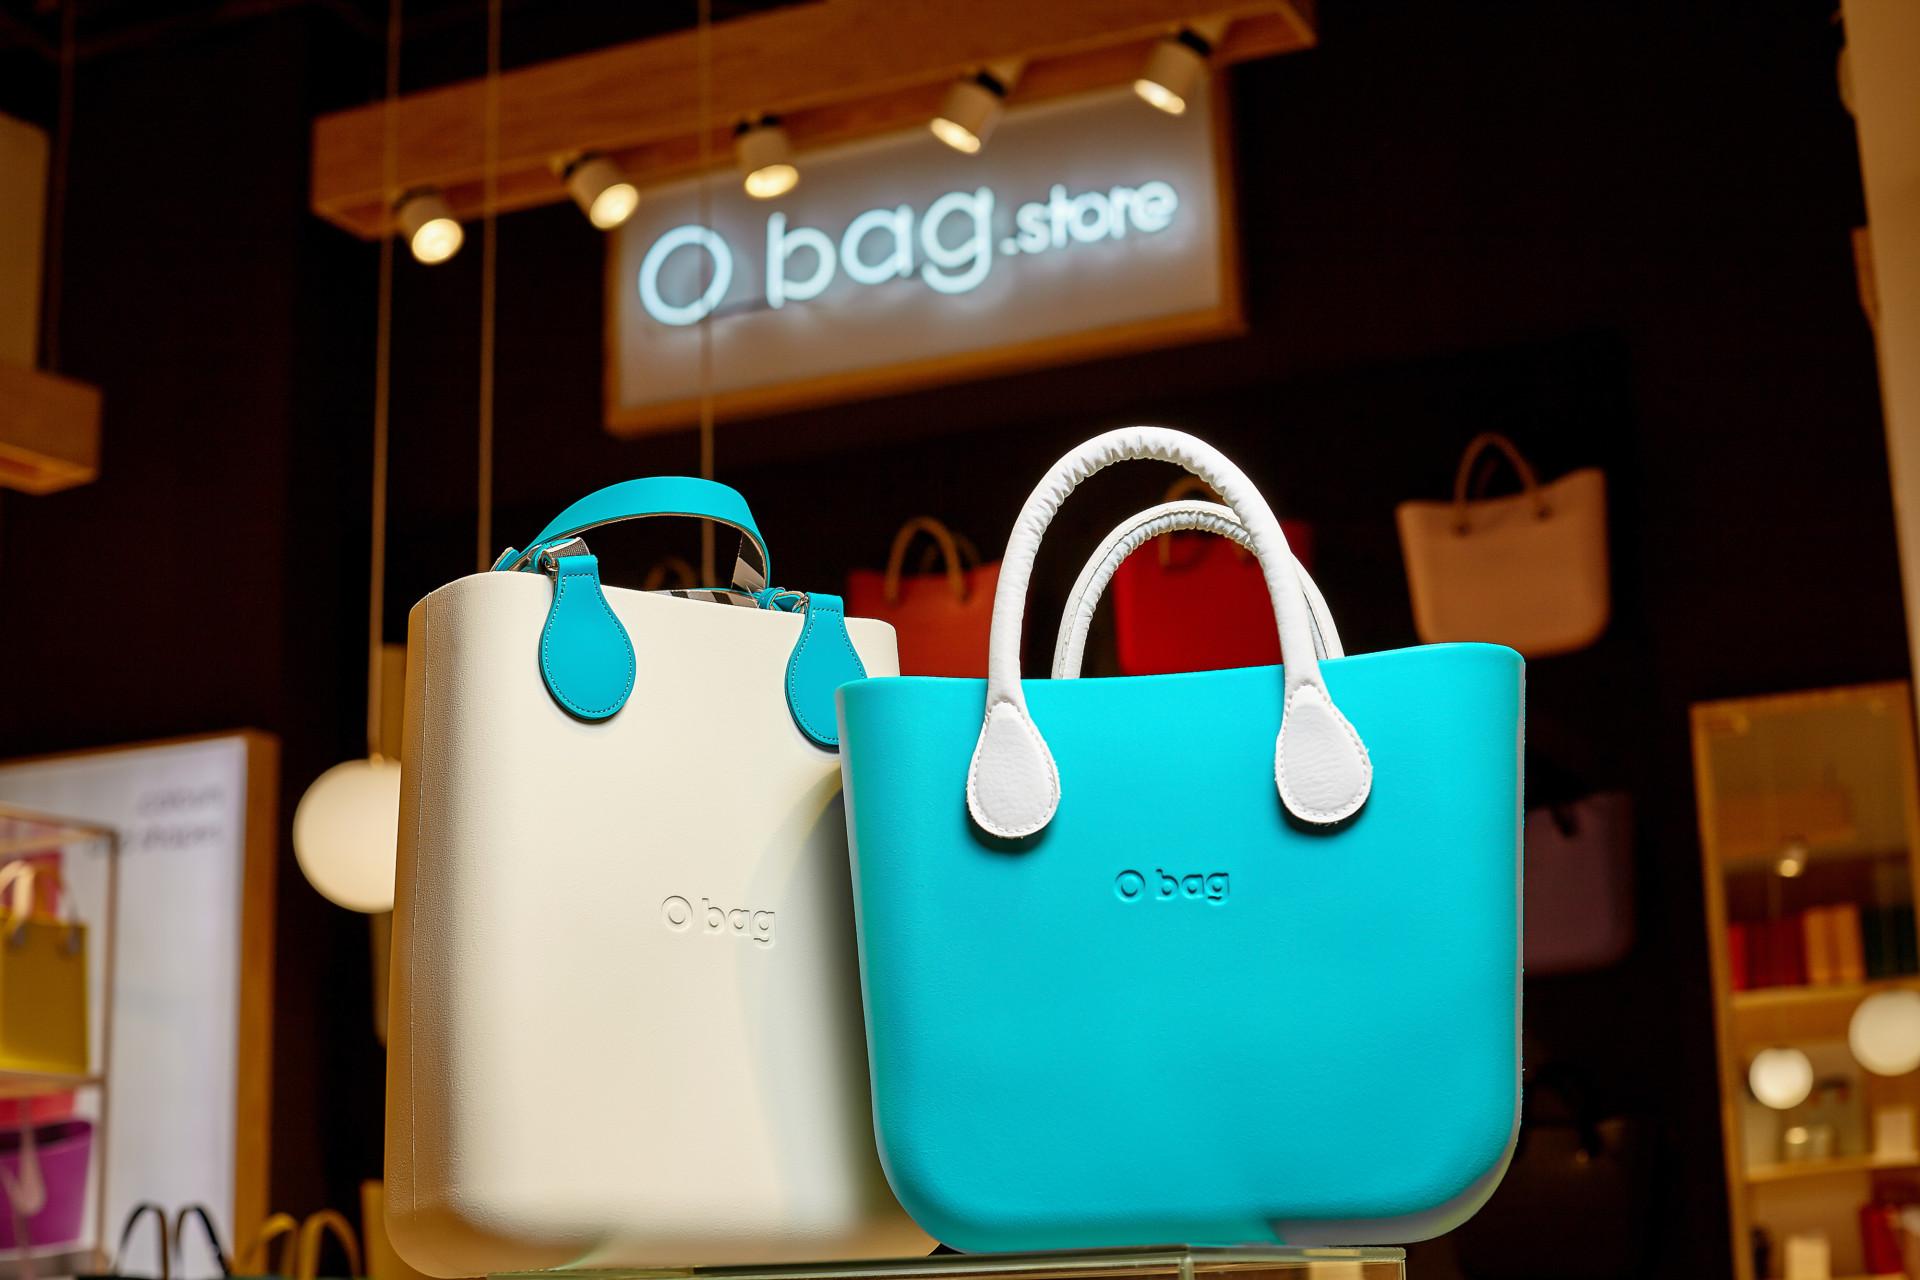 562e4095e0c4 O Bag Ukraine: Наш успех напрямую связан с концепцией бренда